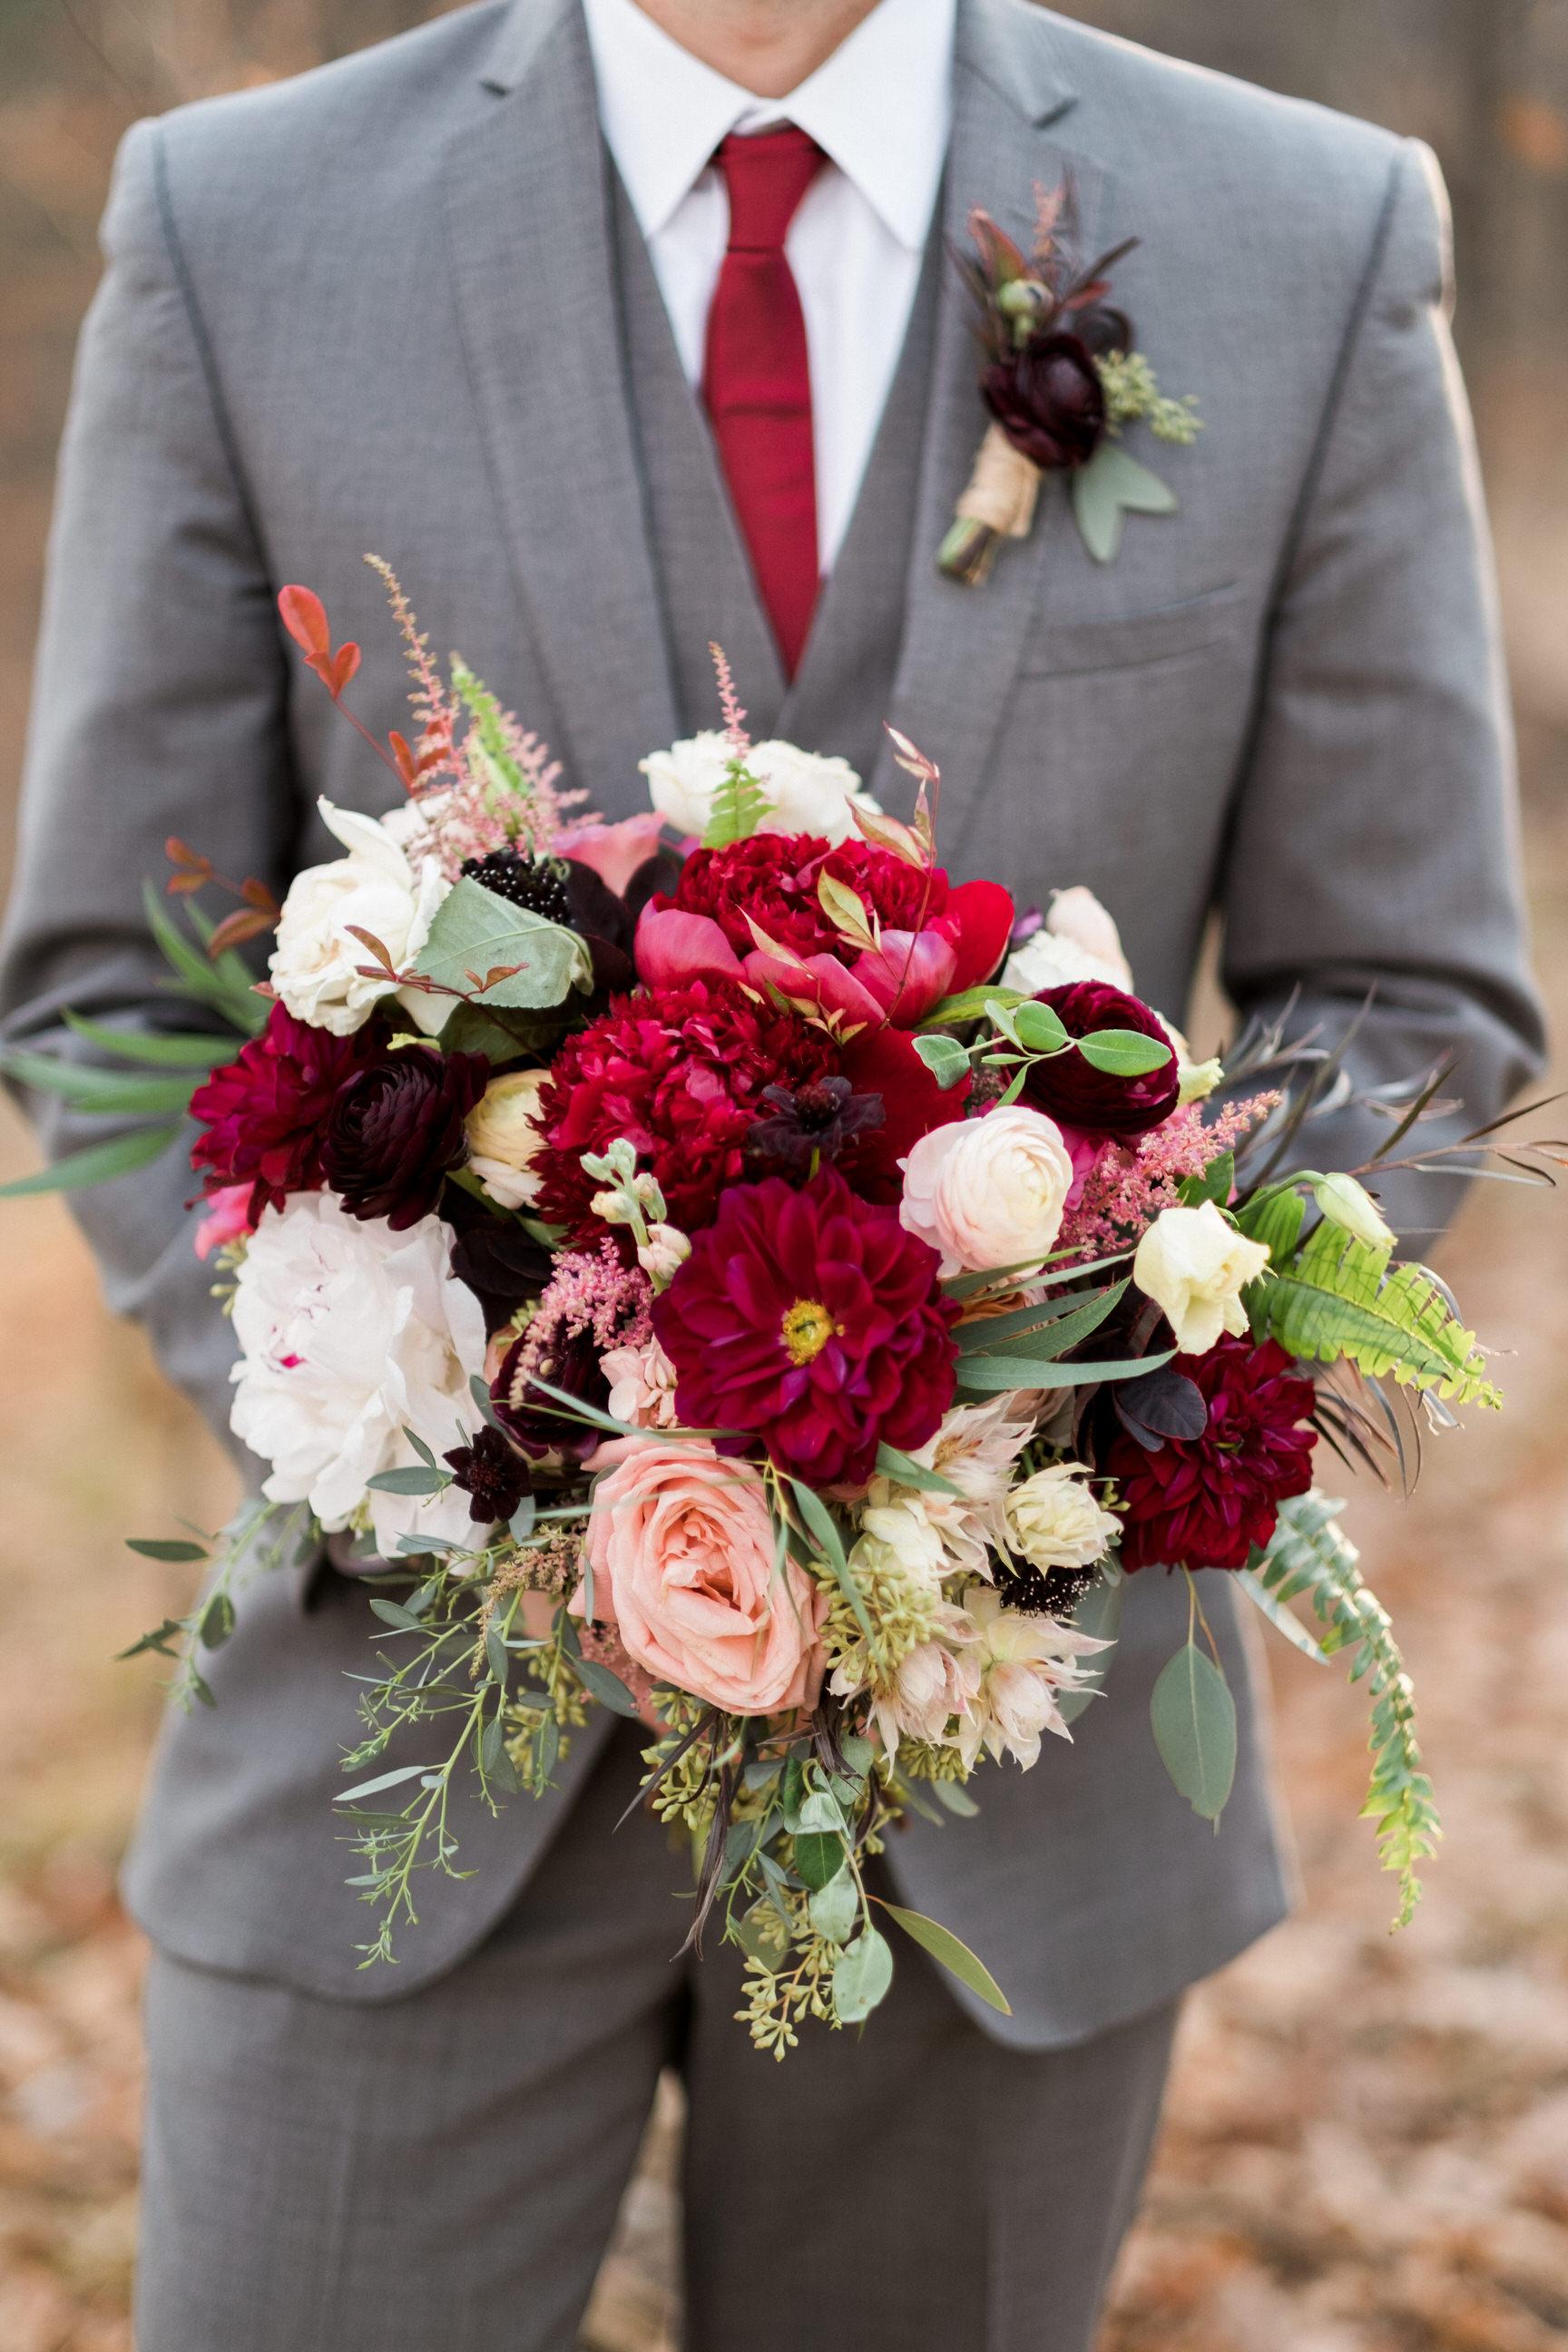 wedding planners in brainerd, mn